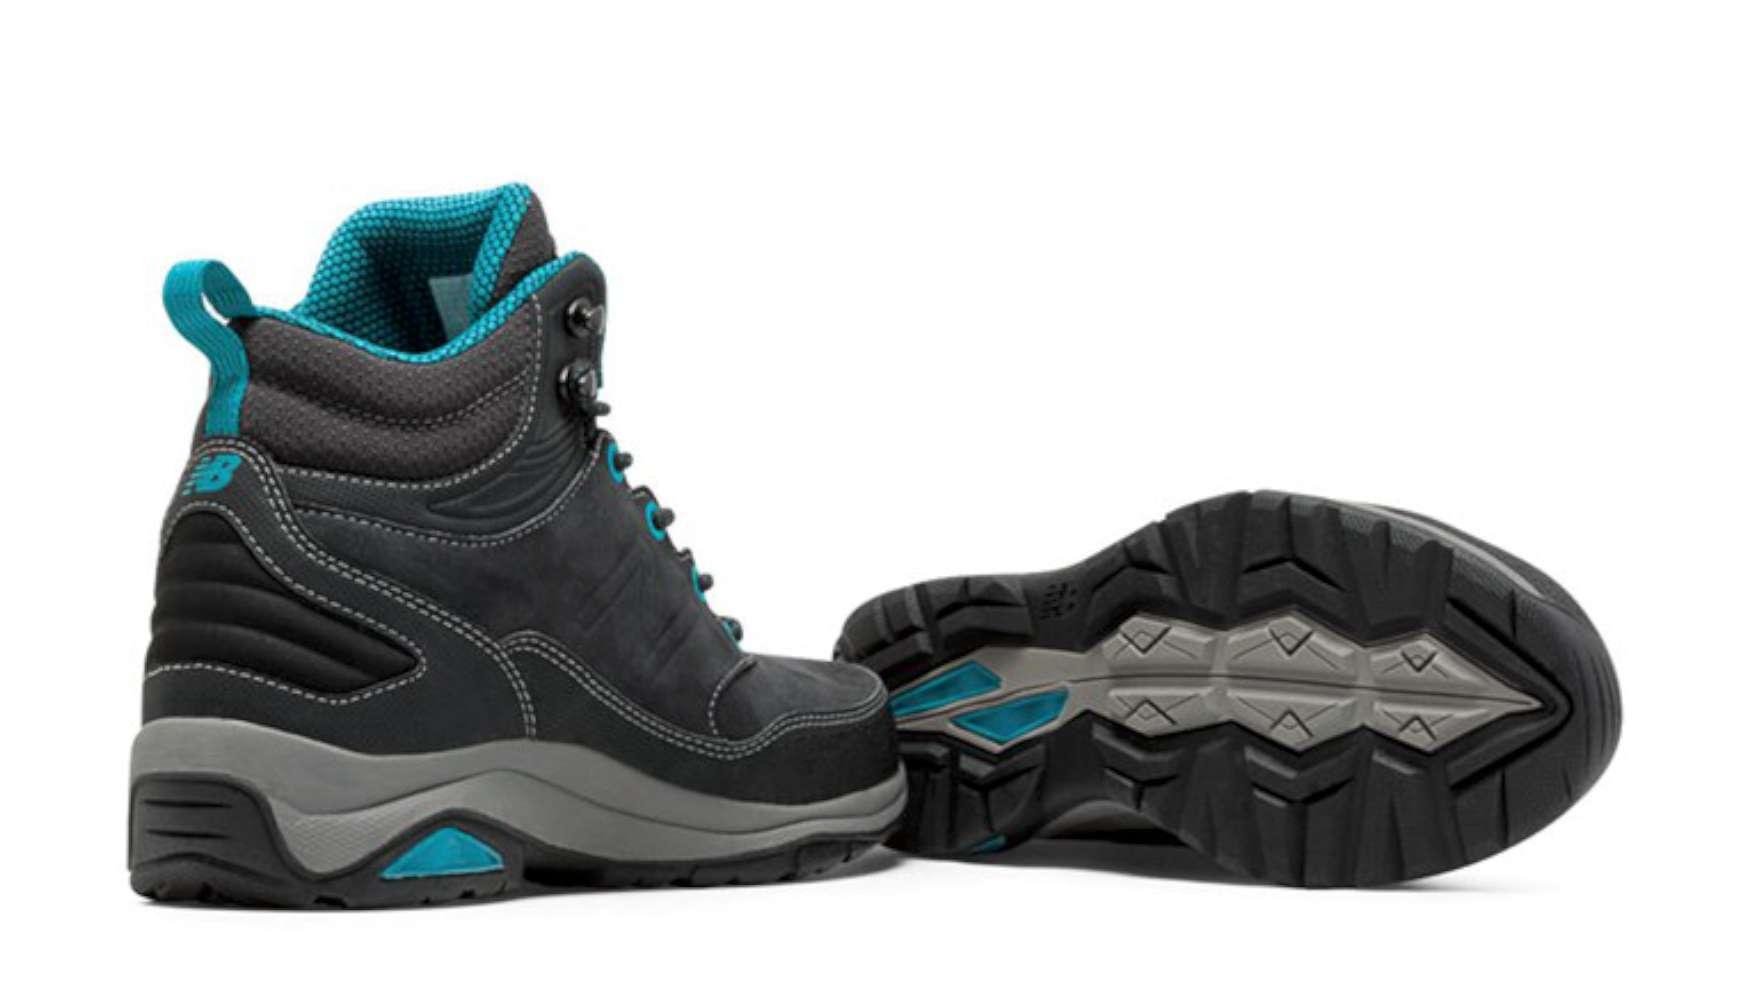 New Up Balance Damenschuhe WW1400TG Hight Top Lace Up New Walking Schuhes, Grau ... ace4a6